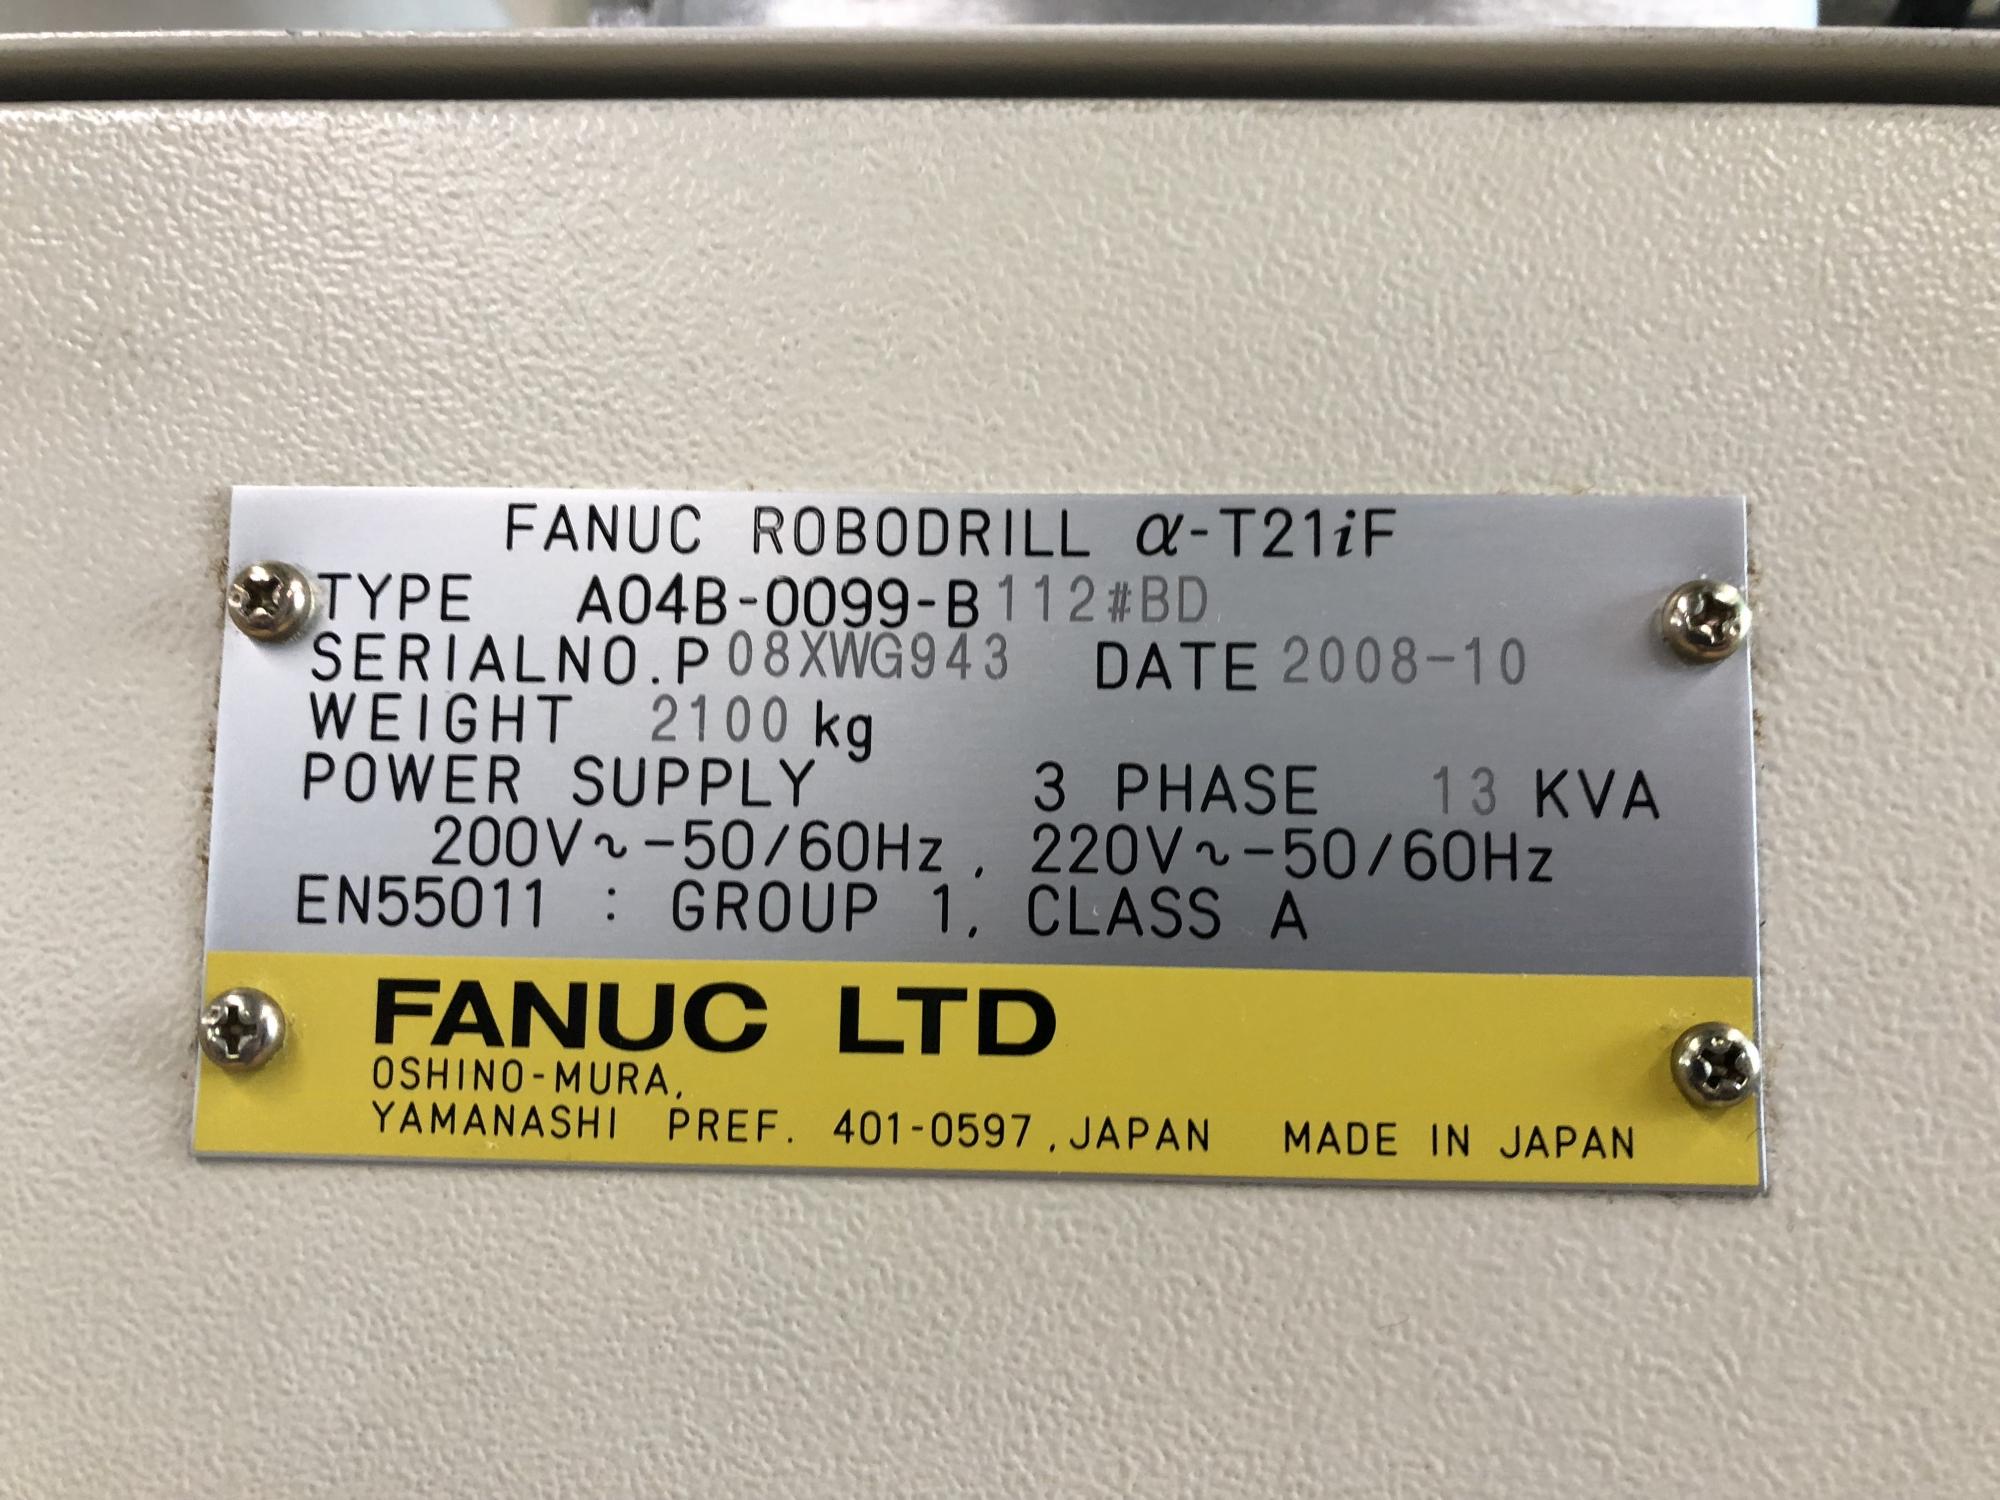 2008 FANUC Robodrill a-T21iF - 5 Axis - Vertical Machining Center